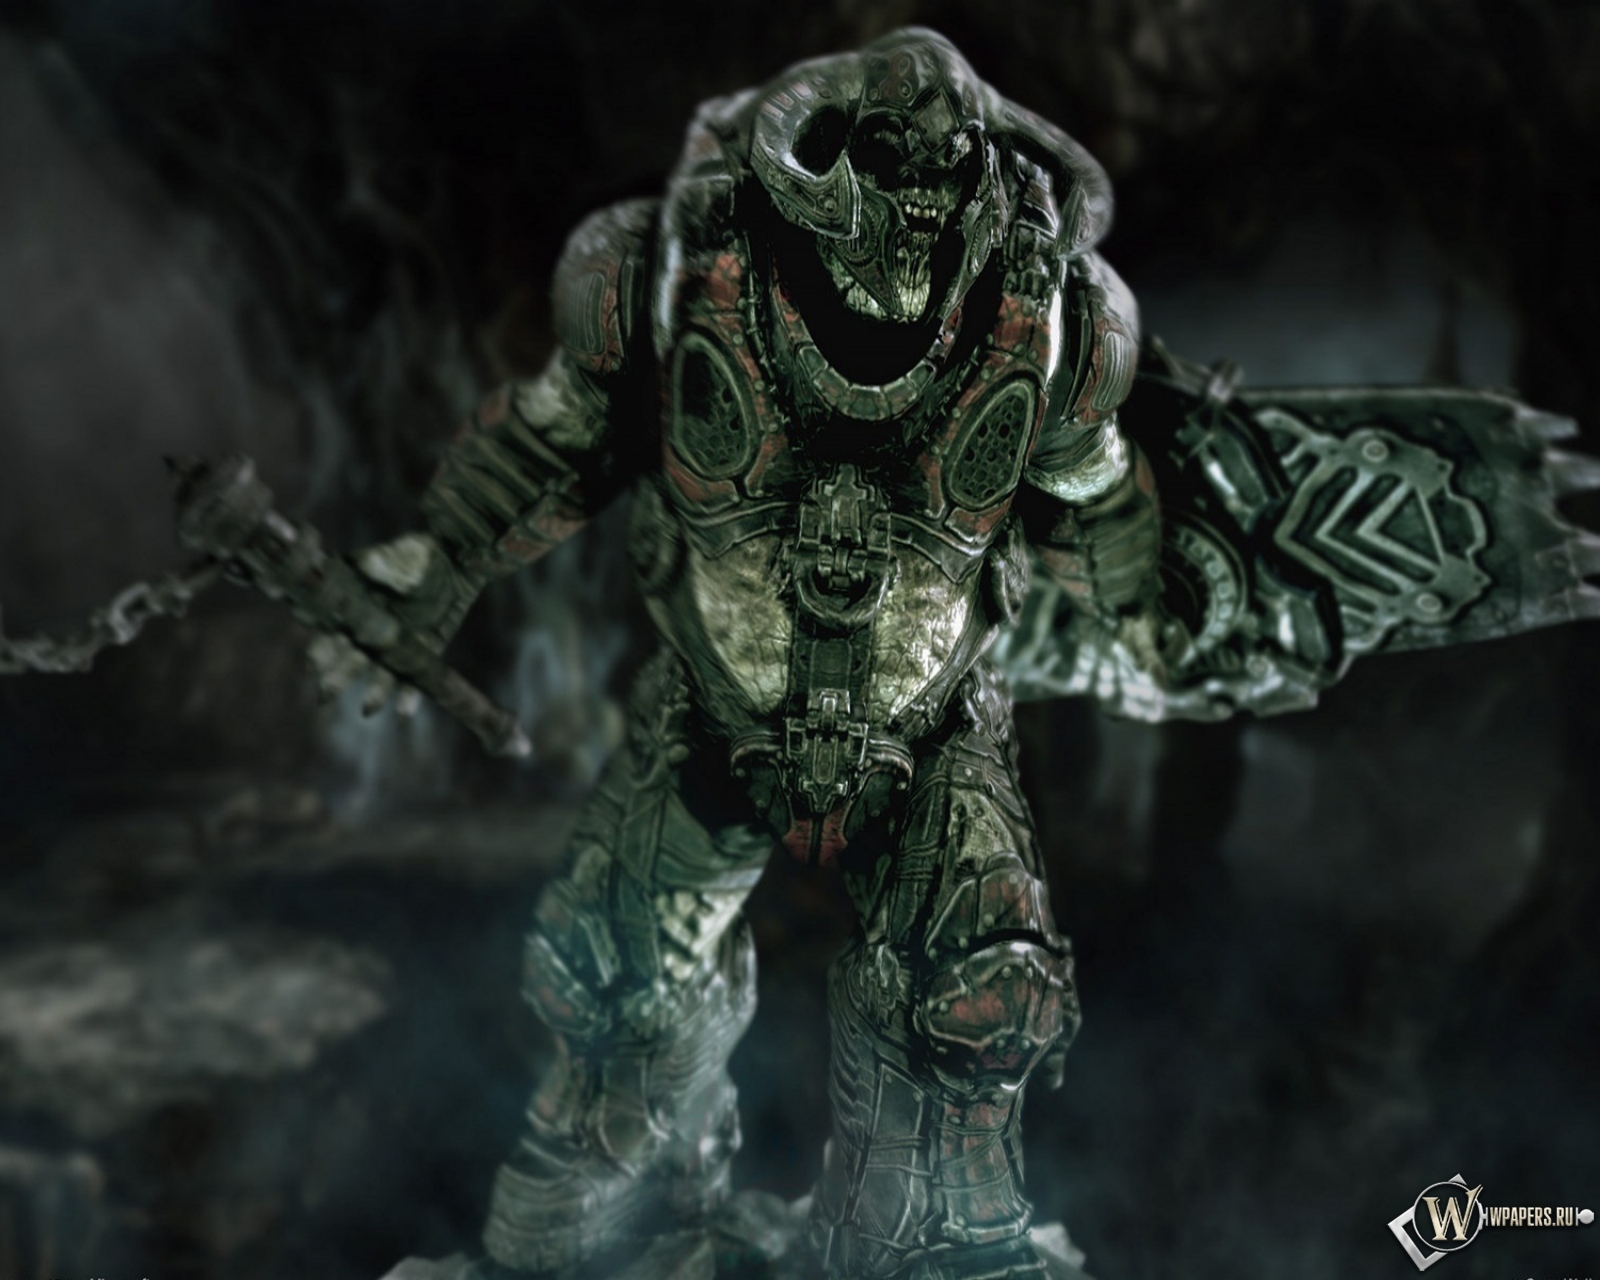 Скачать обои Gears Of War Monsters (Gears Of War, Игра